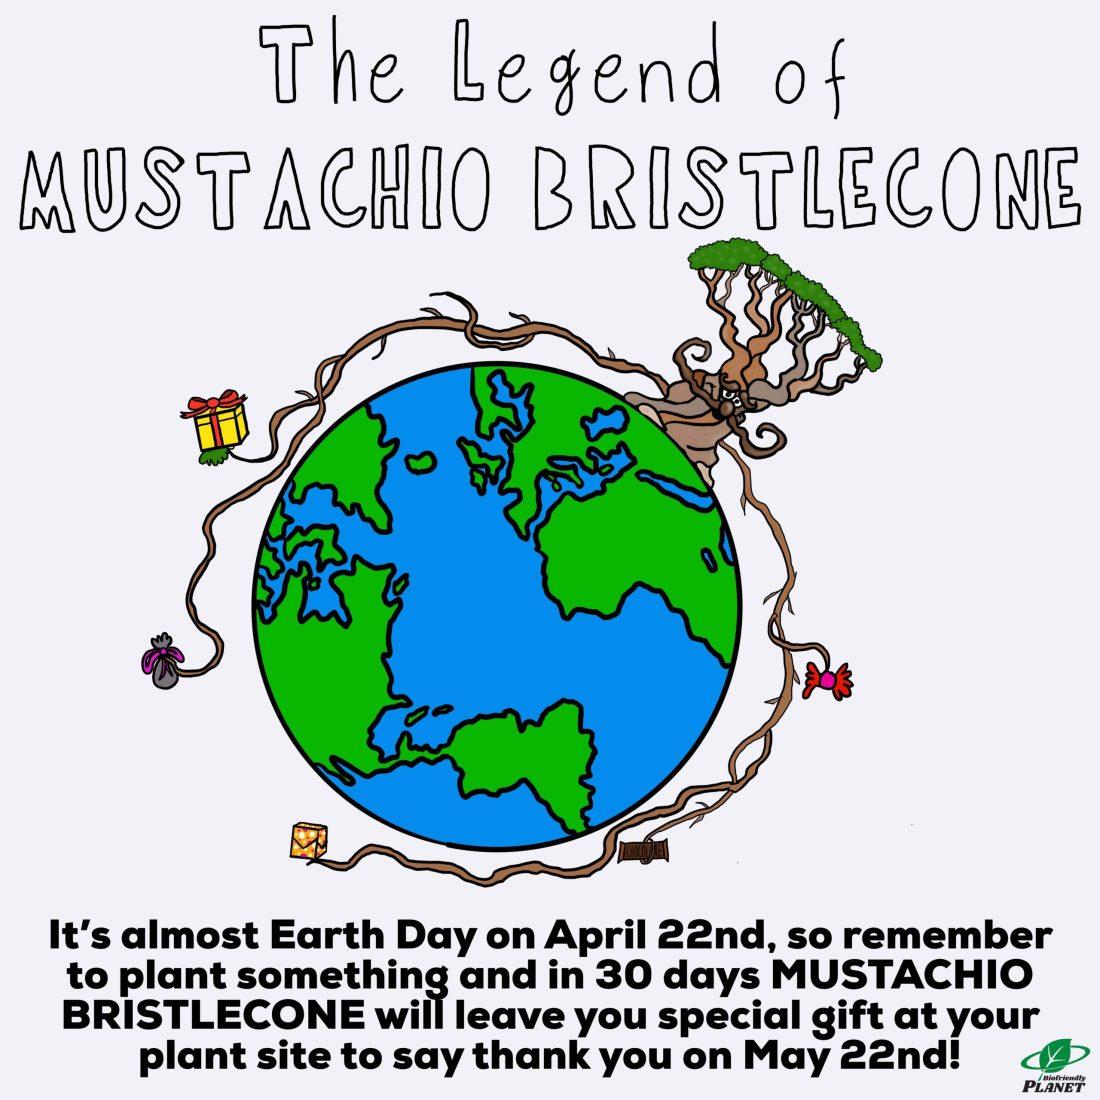 Mustachio Bristlecone | Tuesday Tip